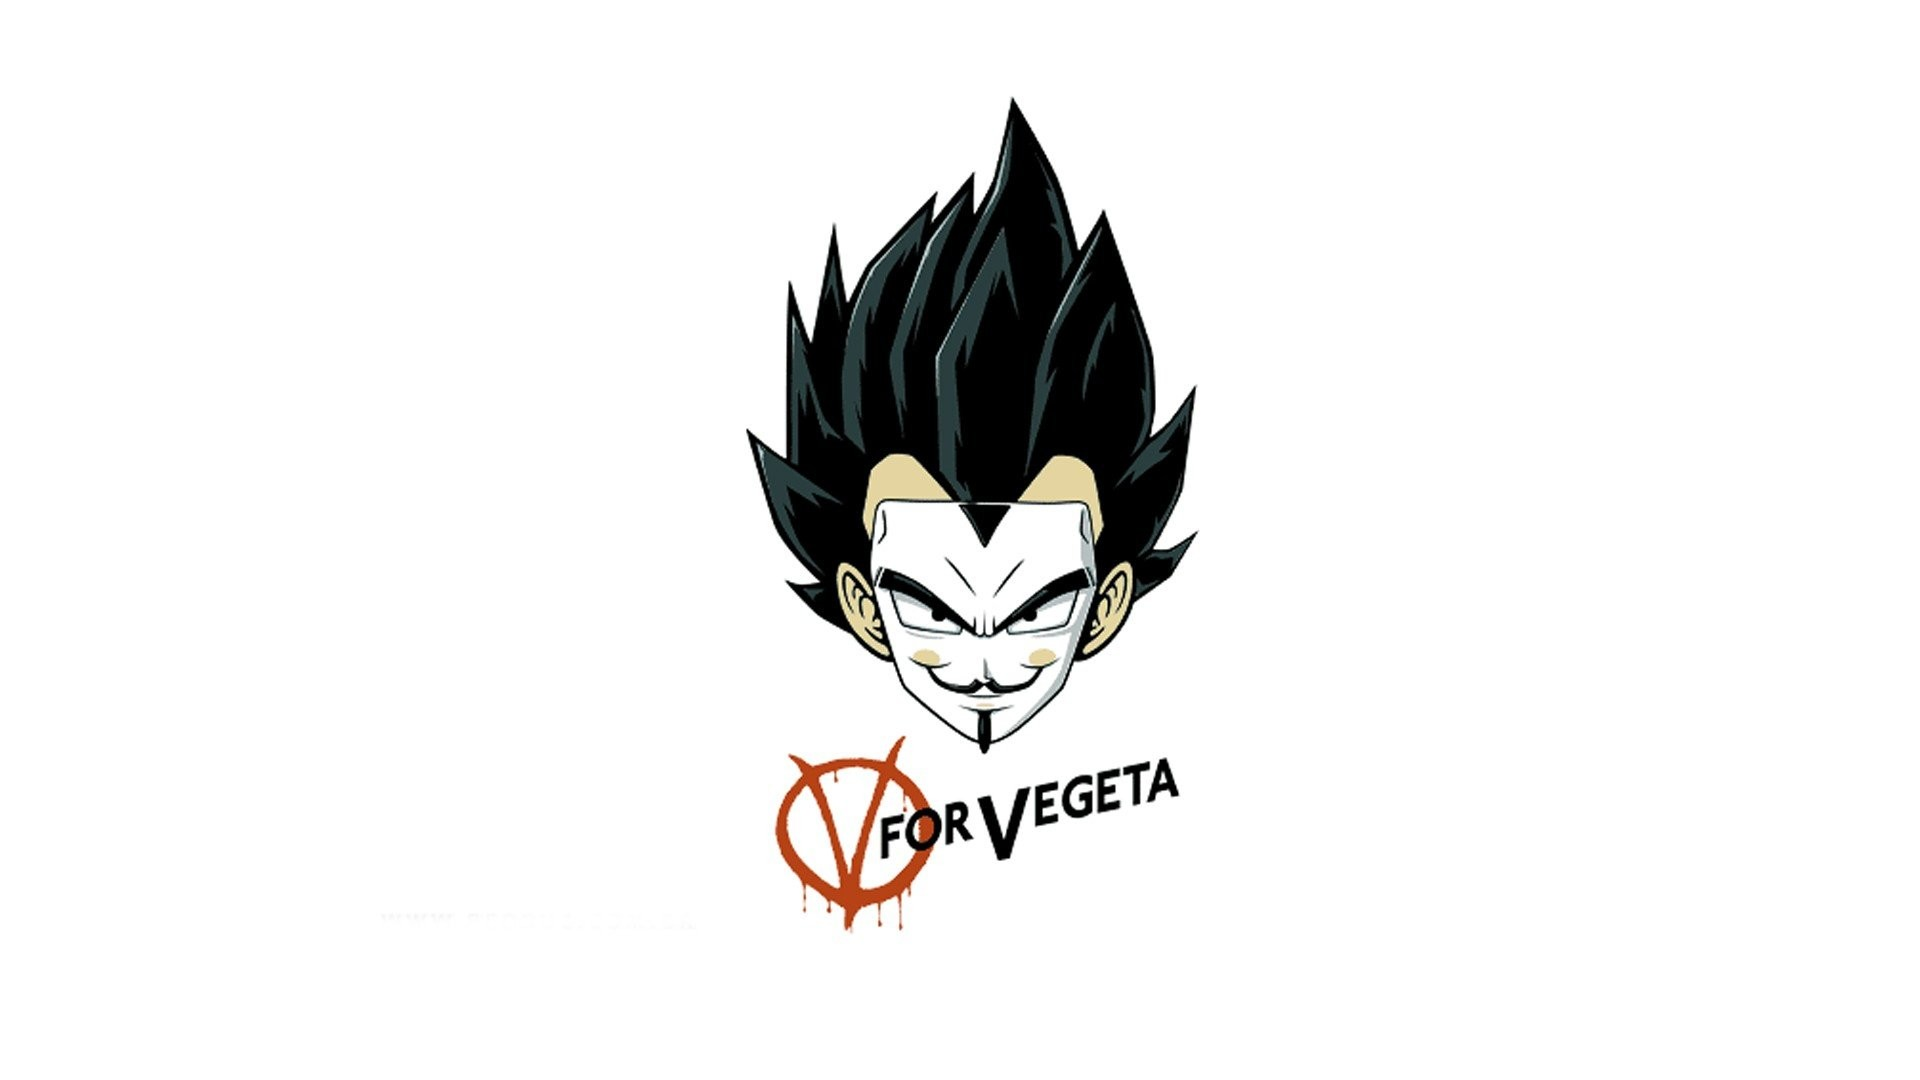 Artwork Crossovers Dragonball Funny Minimalistic Vegeta V For Vendetta  White Background